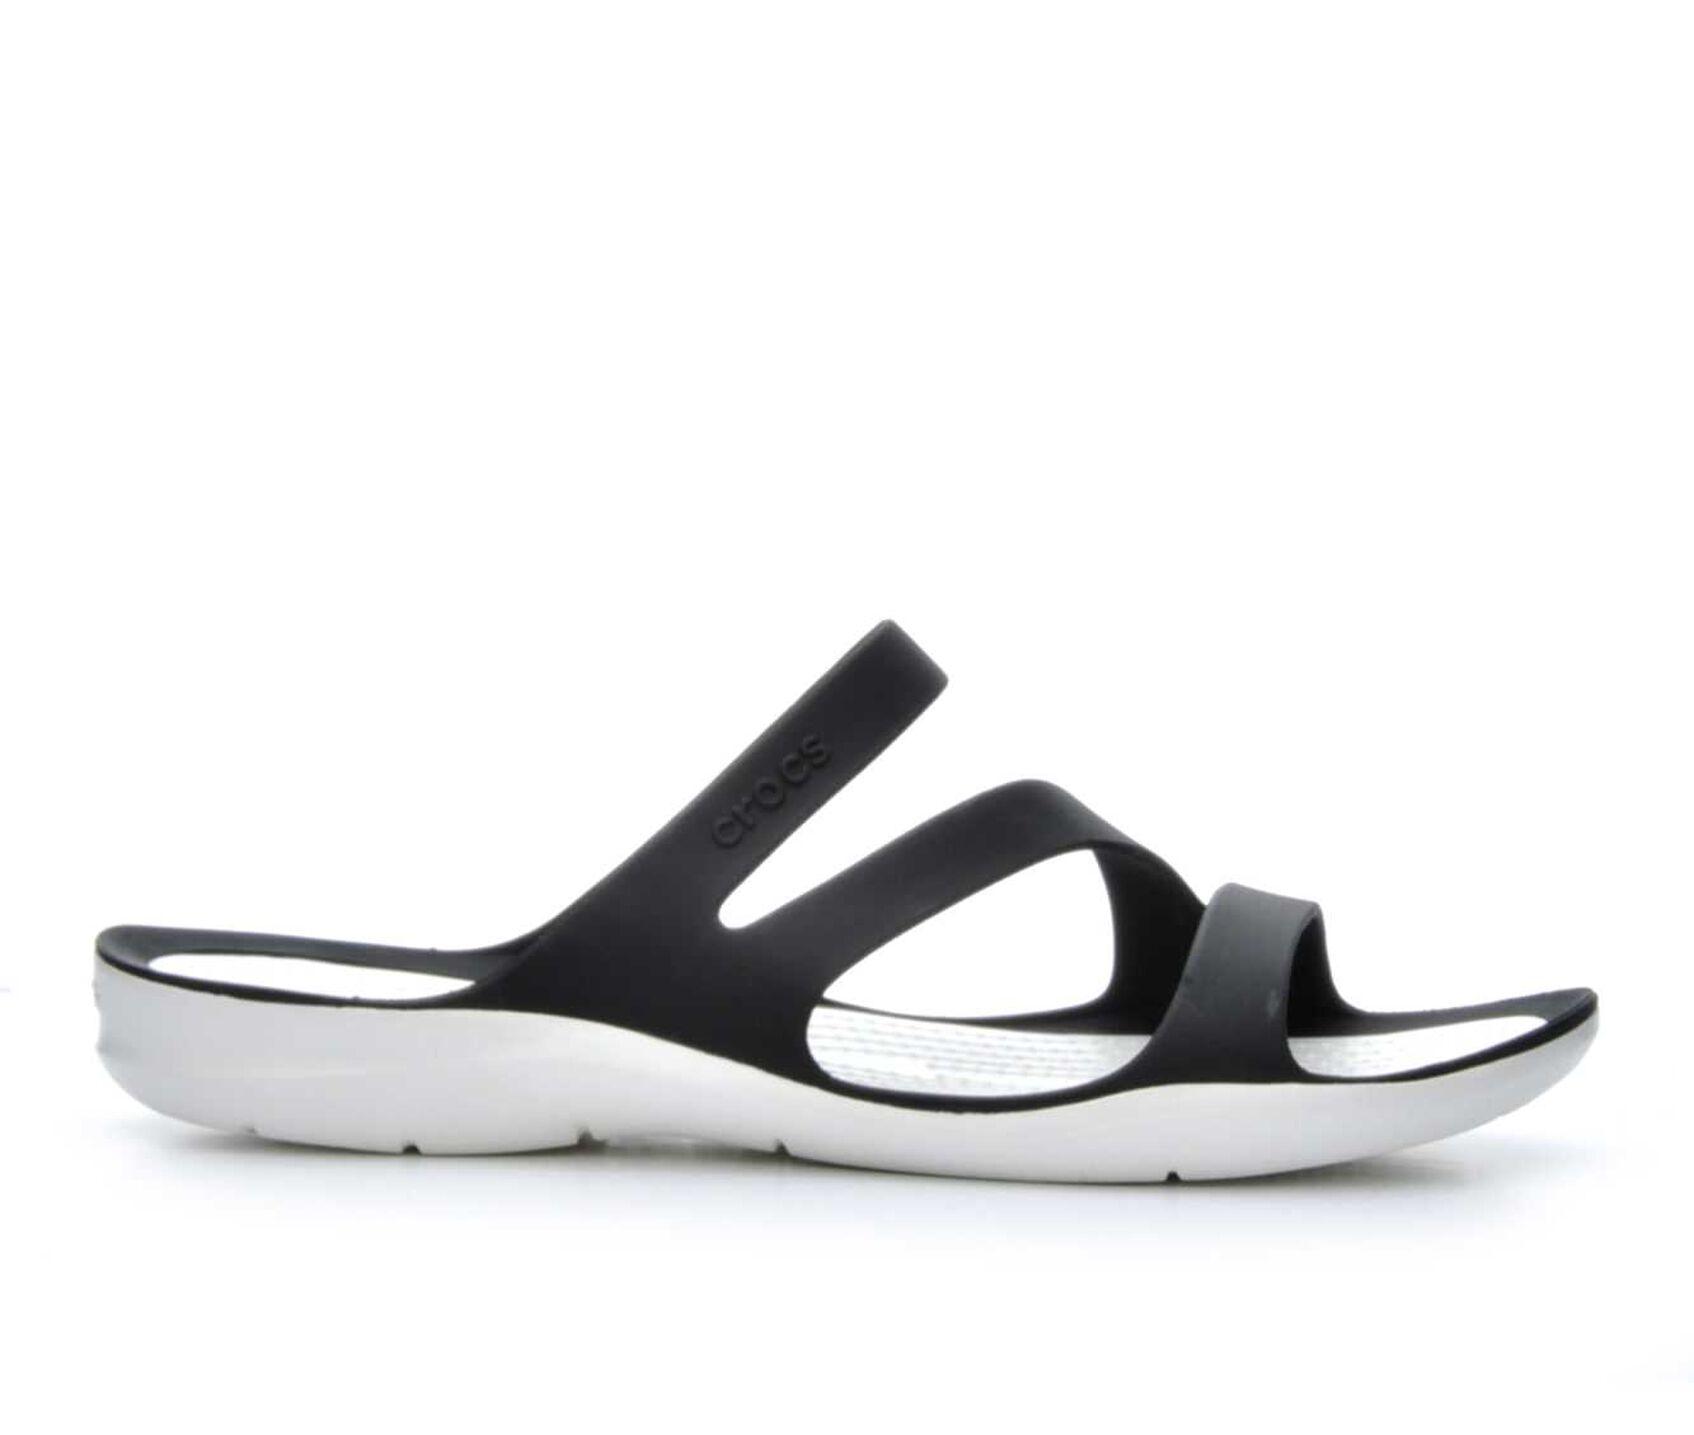 c49c12e64 Women s Crocs Swiftwater Strappy Sandals